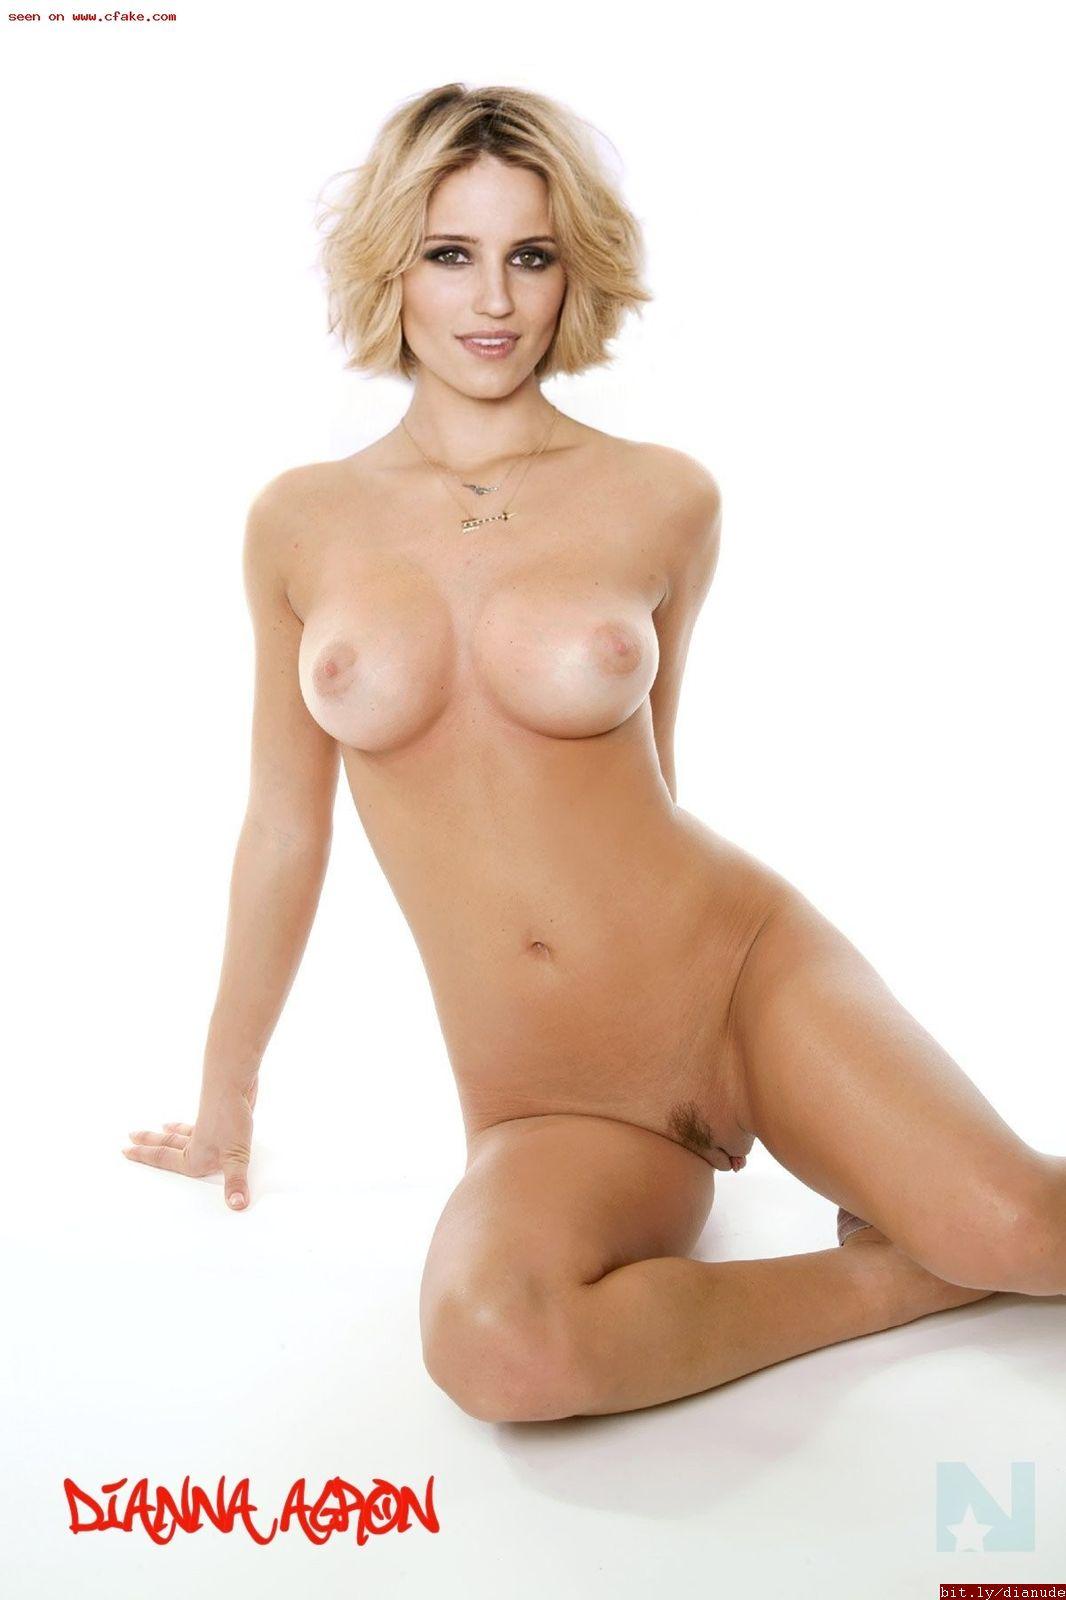 Dianna Agron big boobs